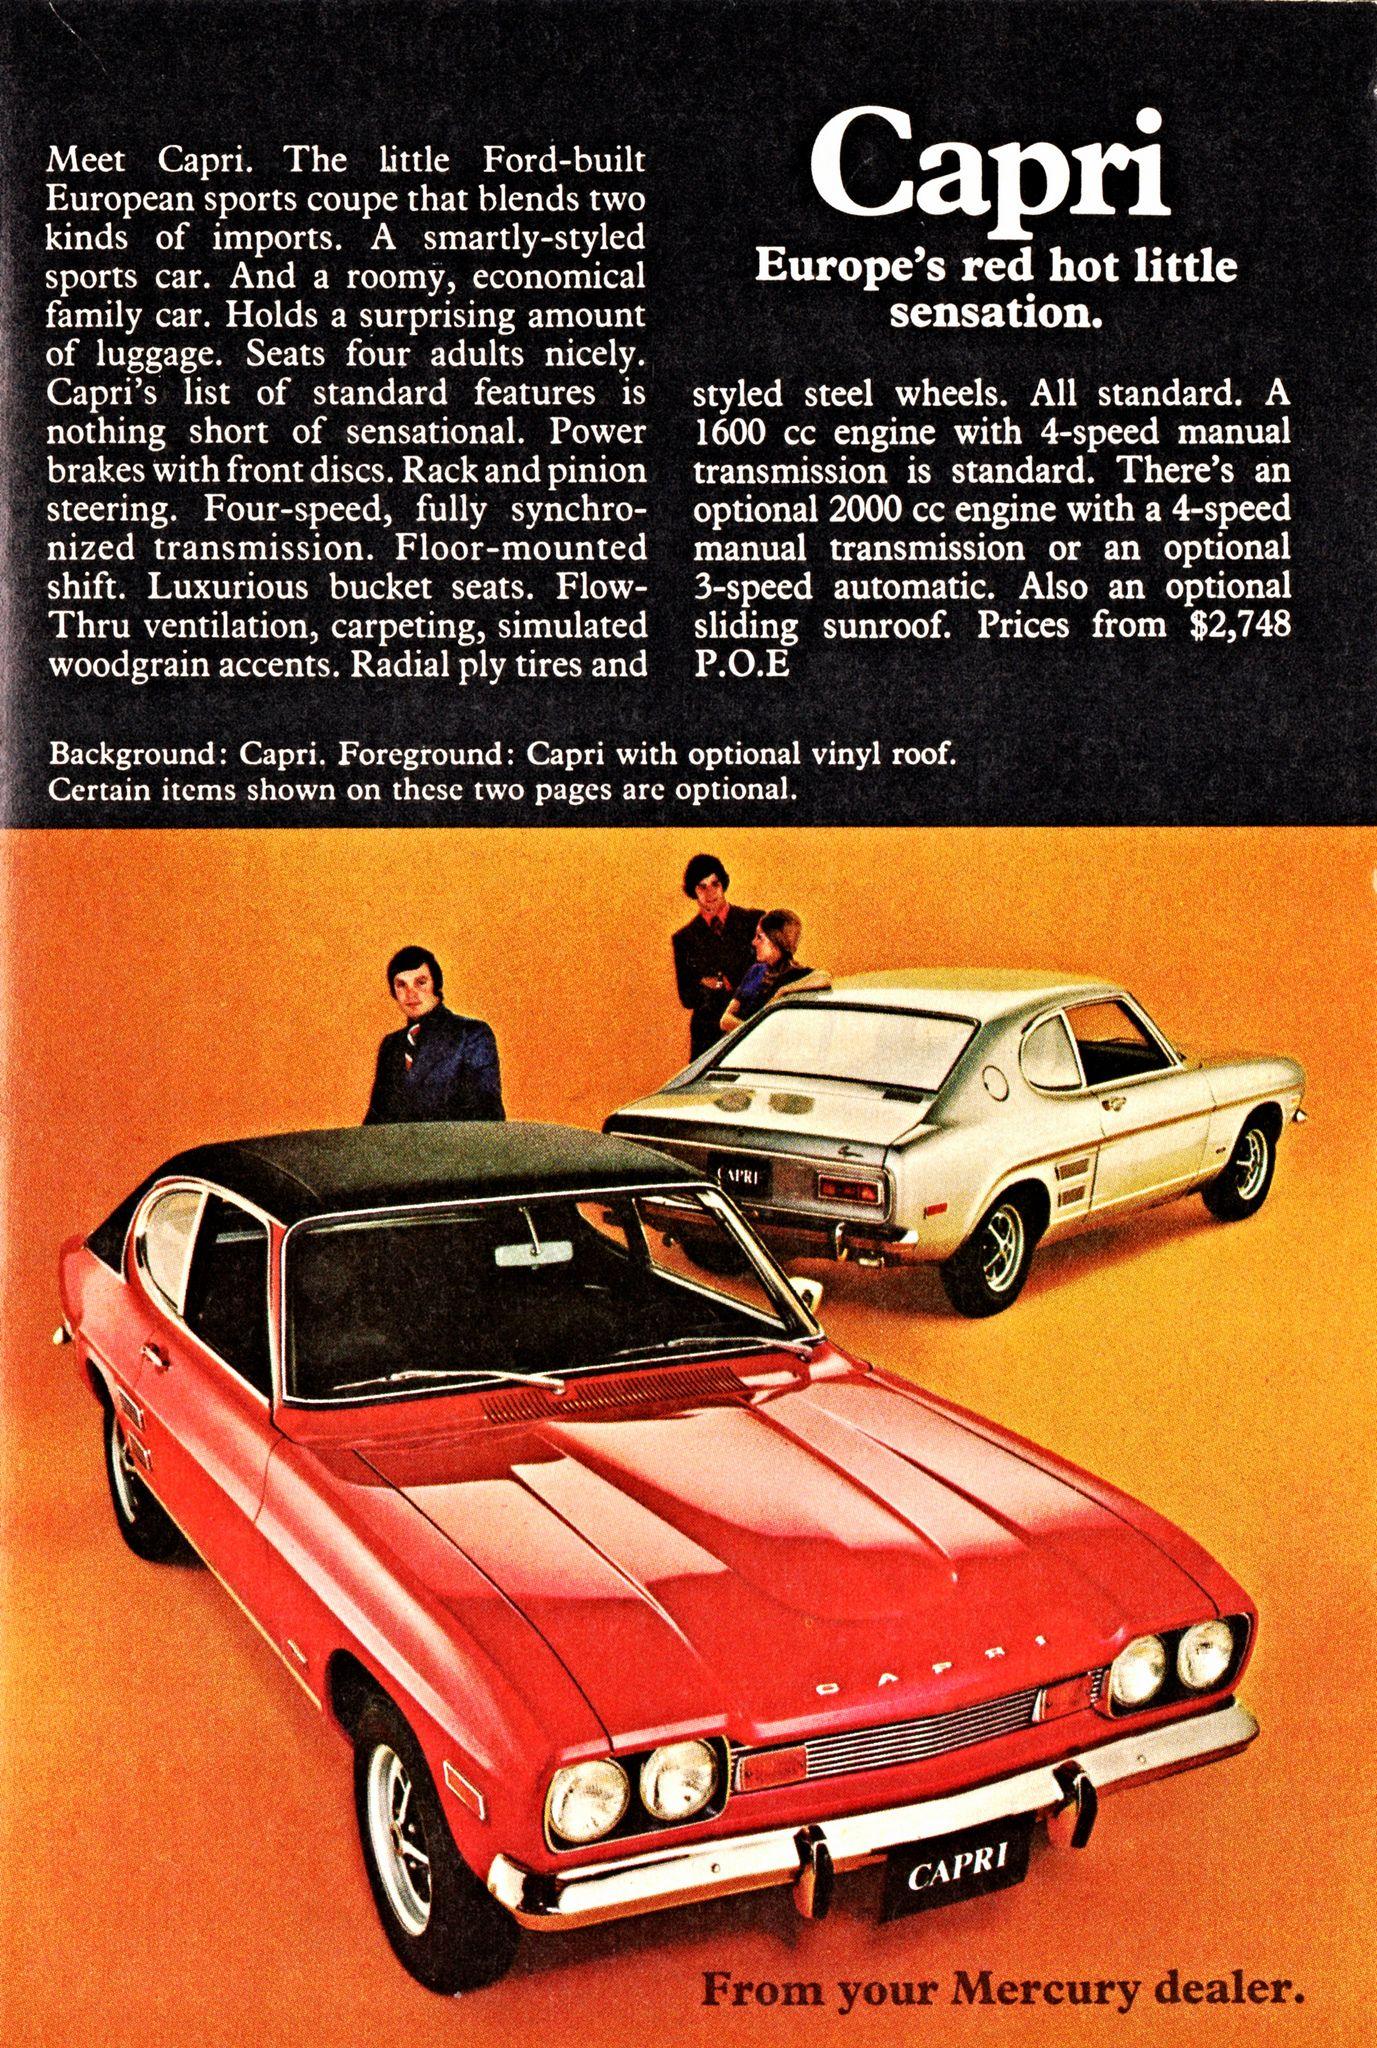 1971 Ford Capri Ad (Canada) | Ford capri, Ford and Cars